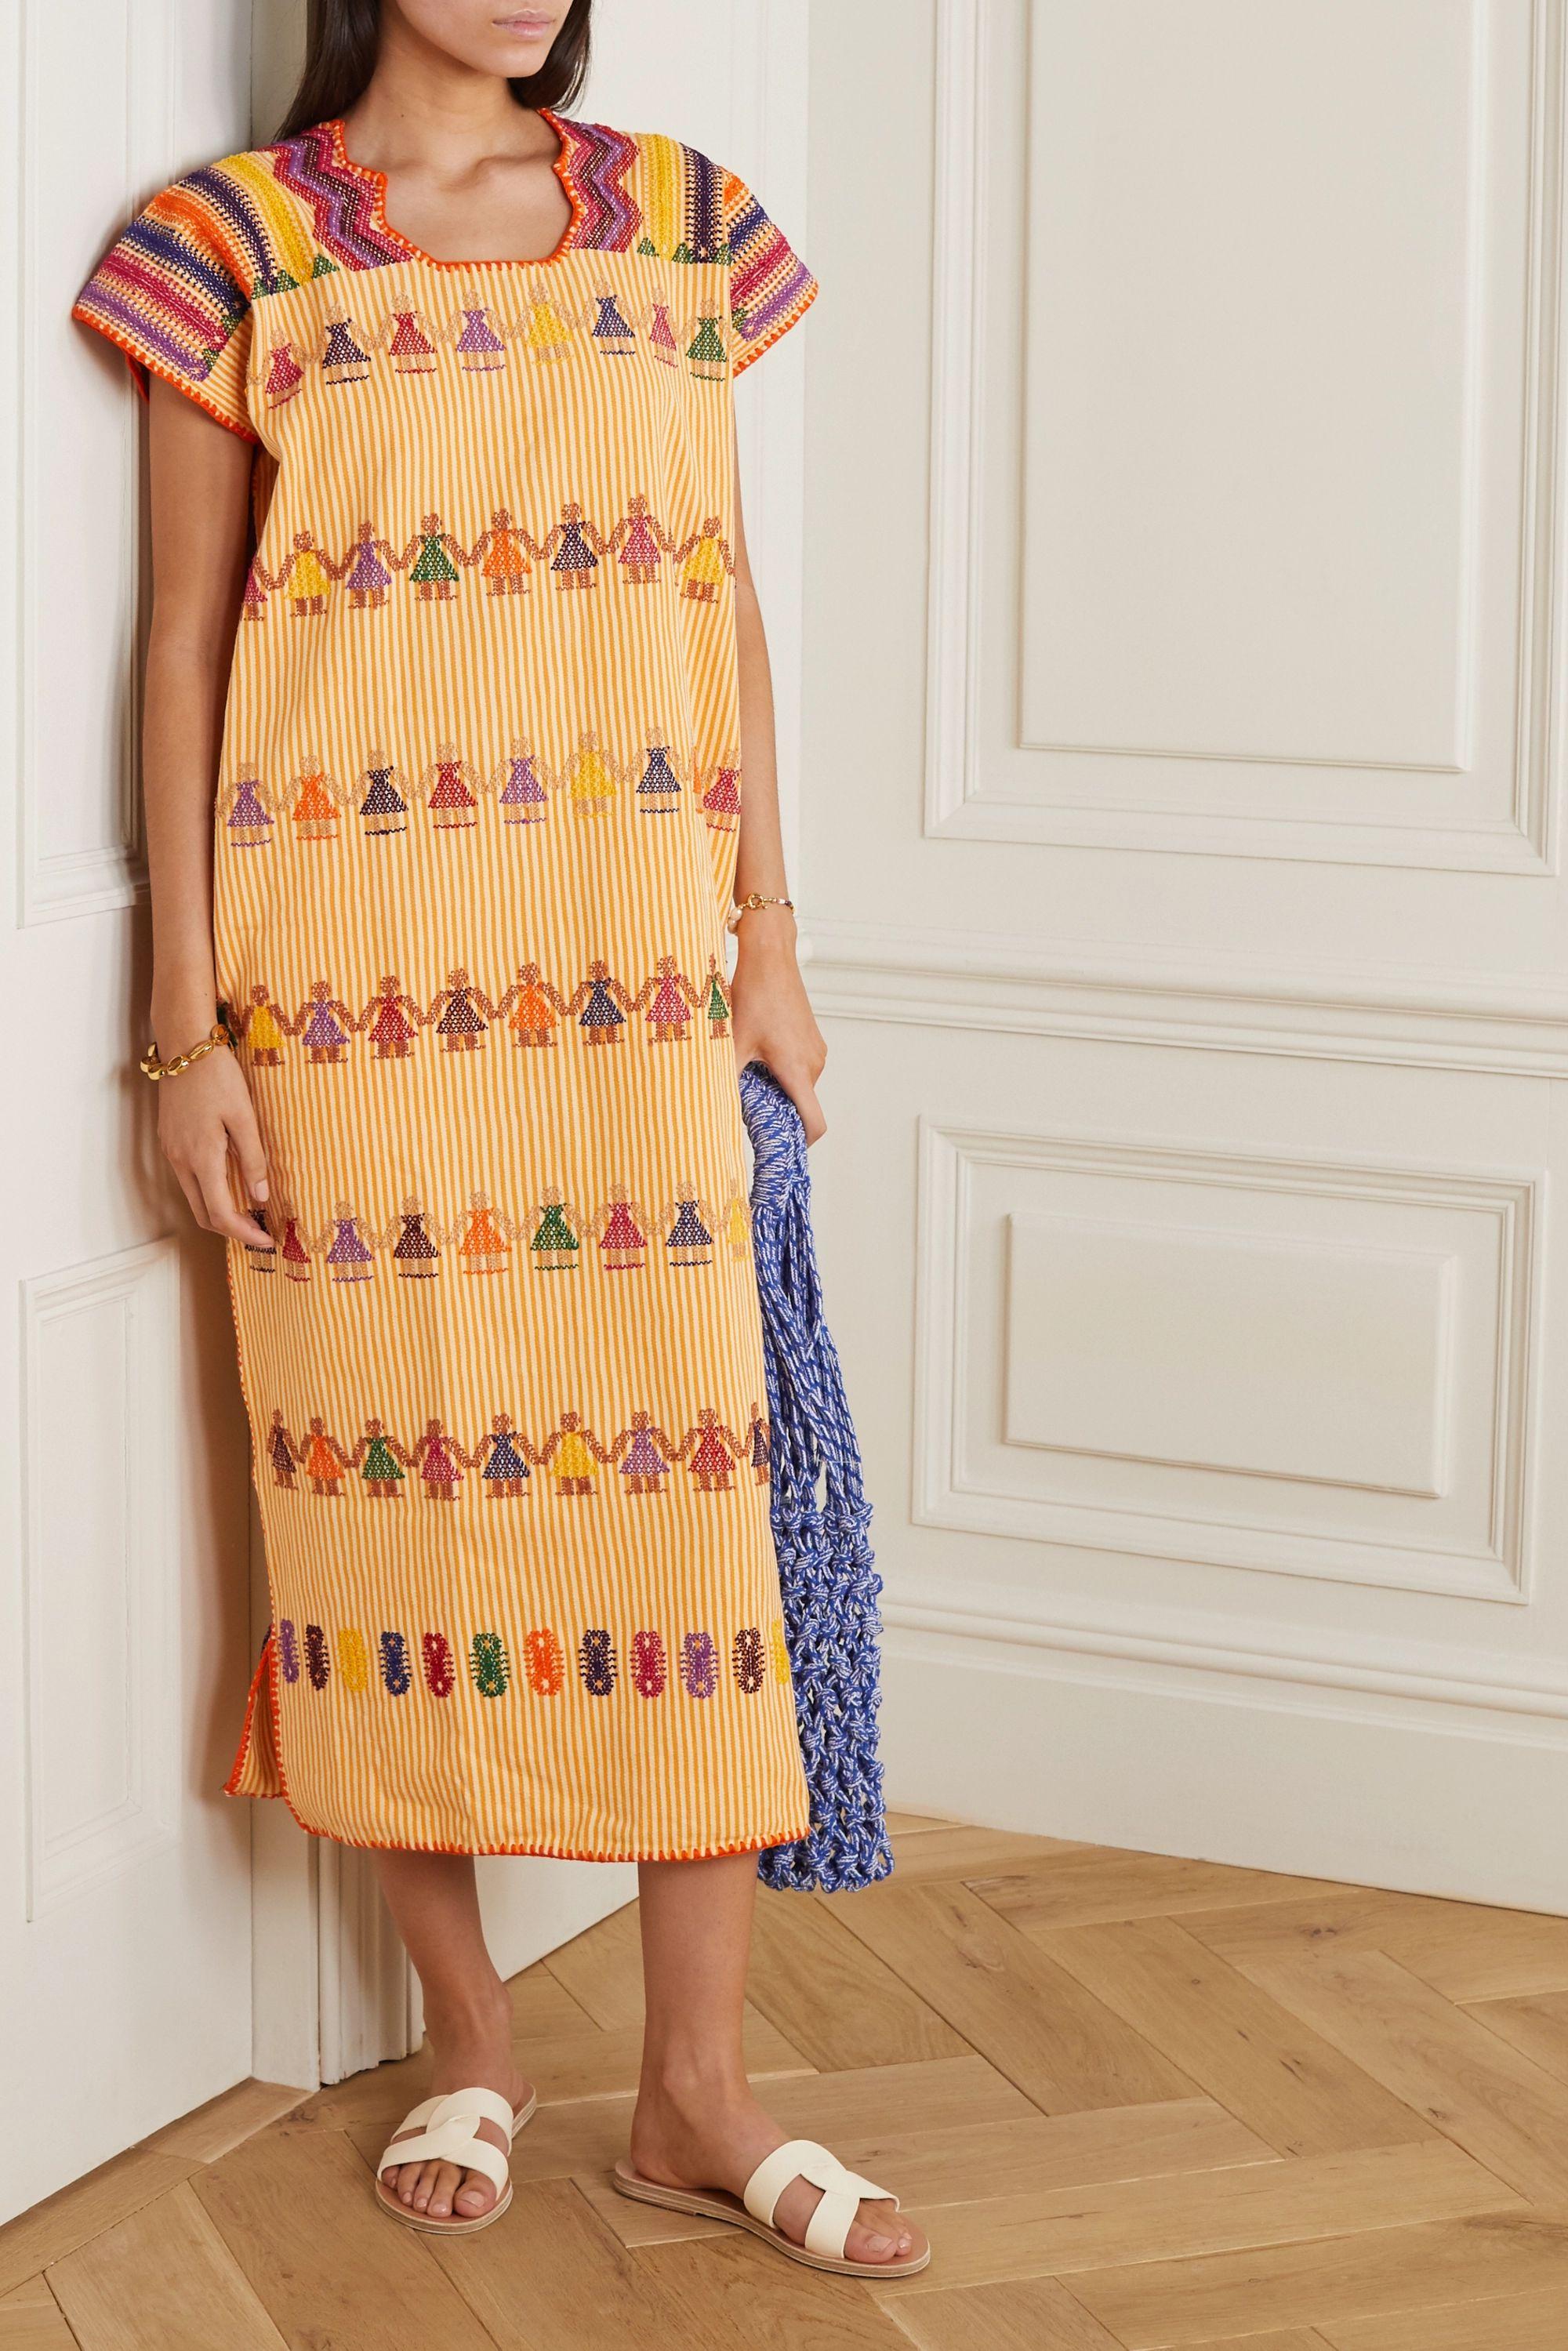 Pippa Holt + NET SUSTAIN embroidered striped cotton kaftan